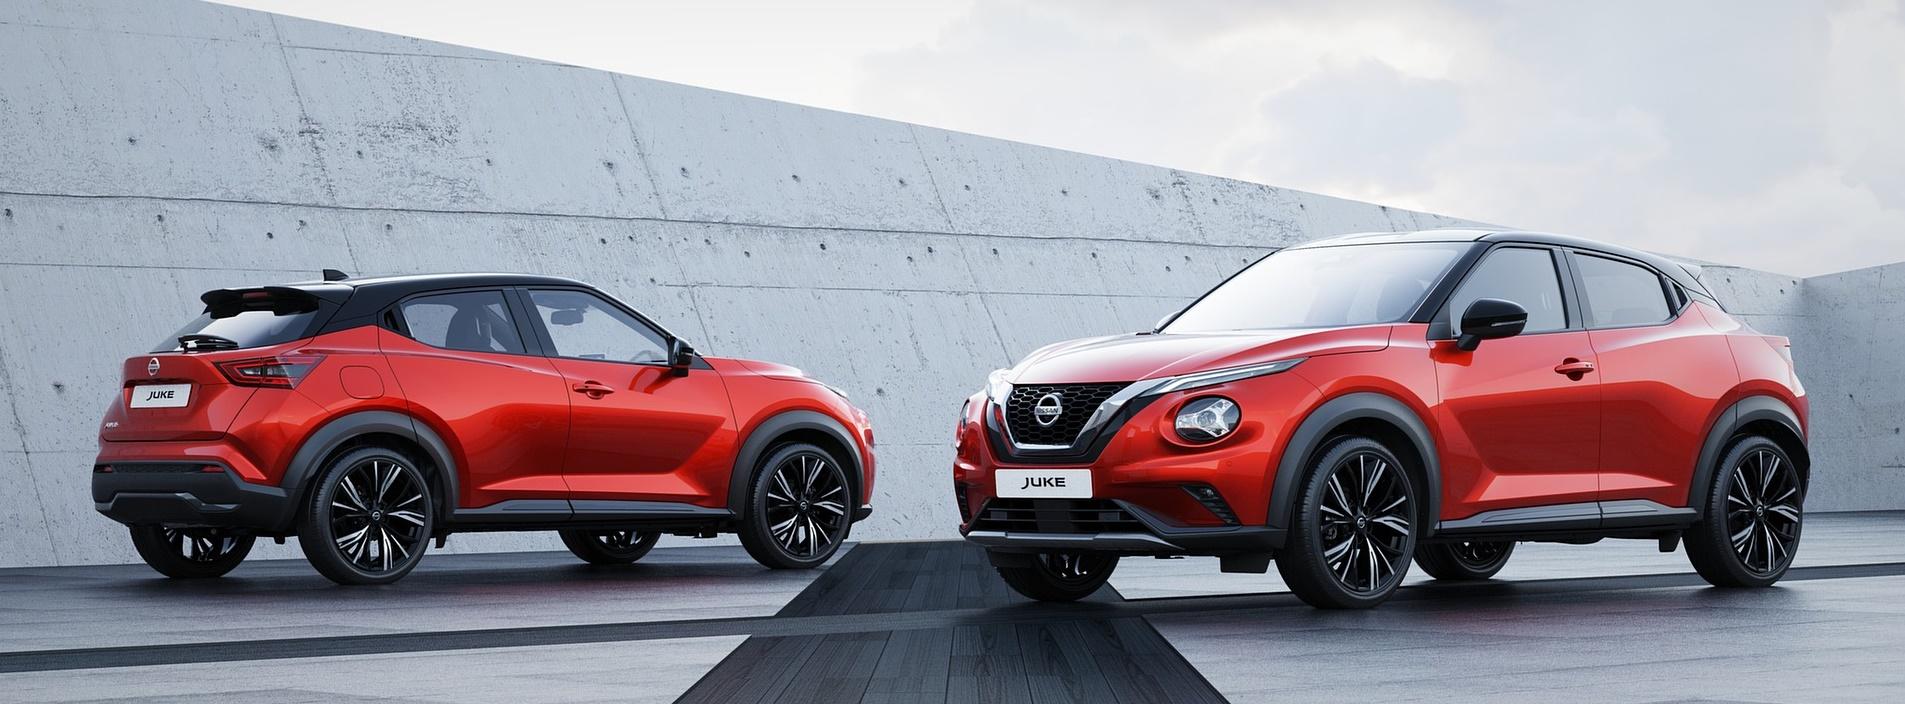 Nissan Juke, svelata la seconda generazione